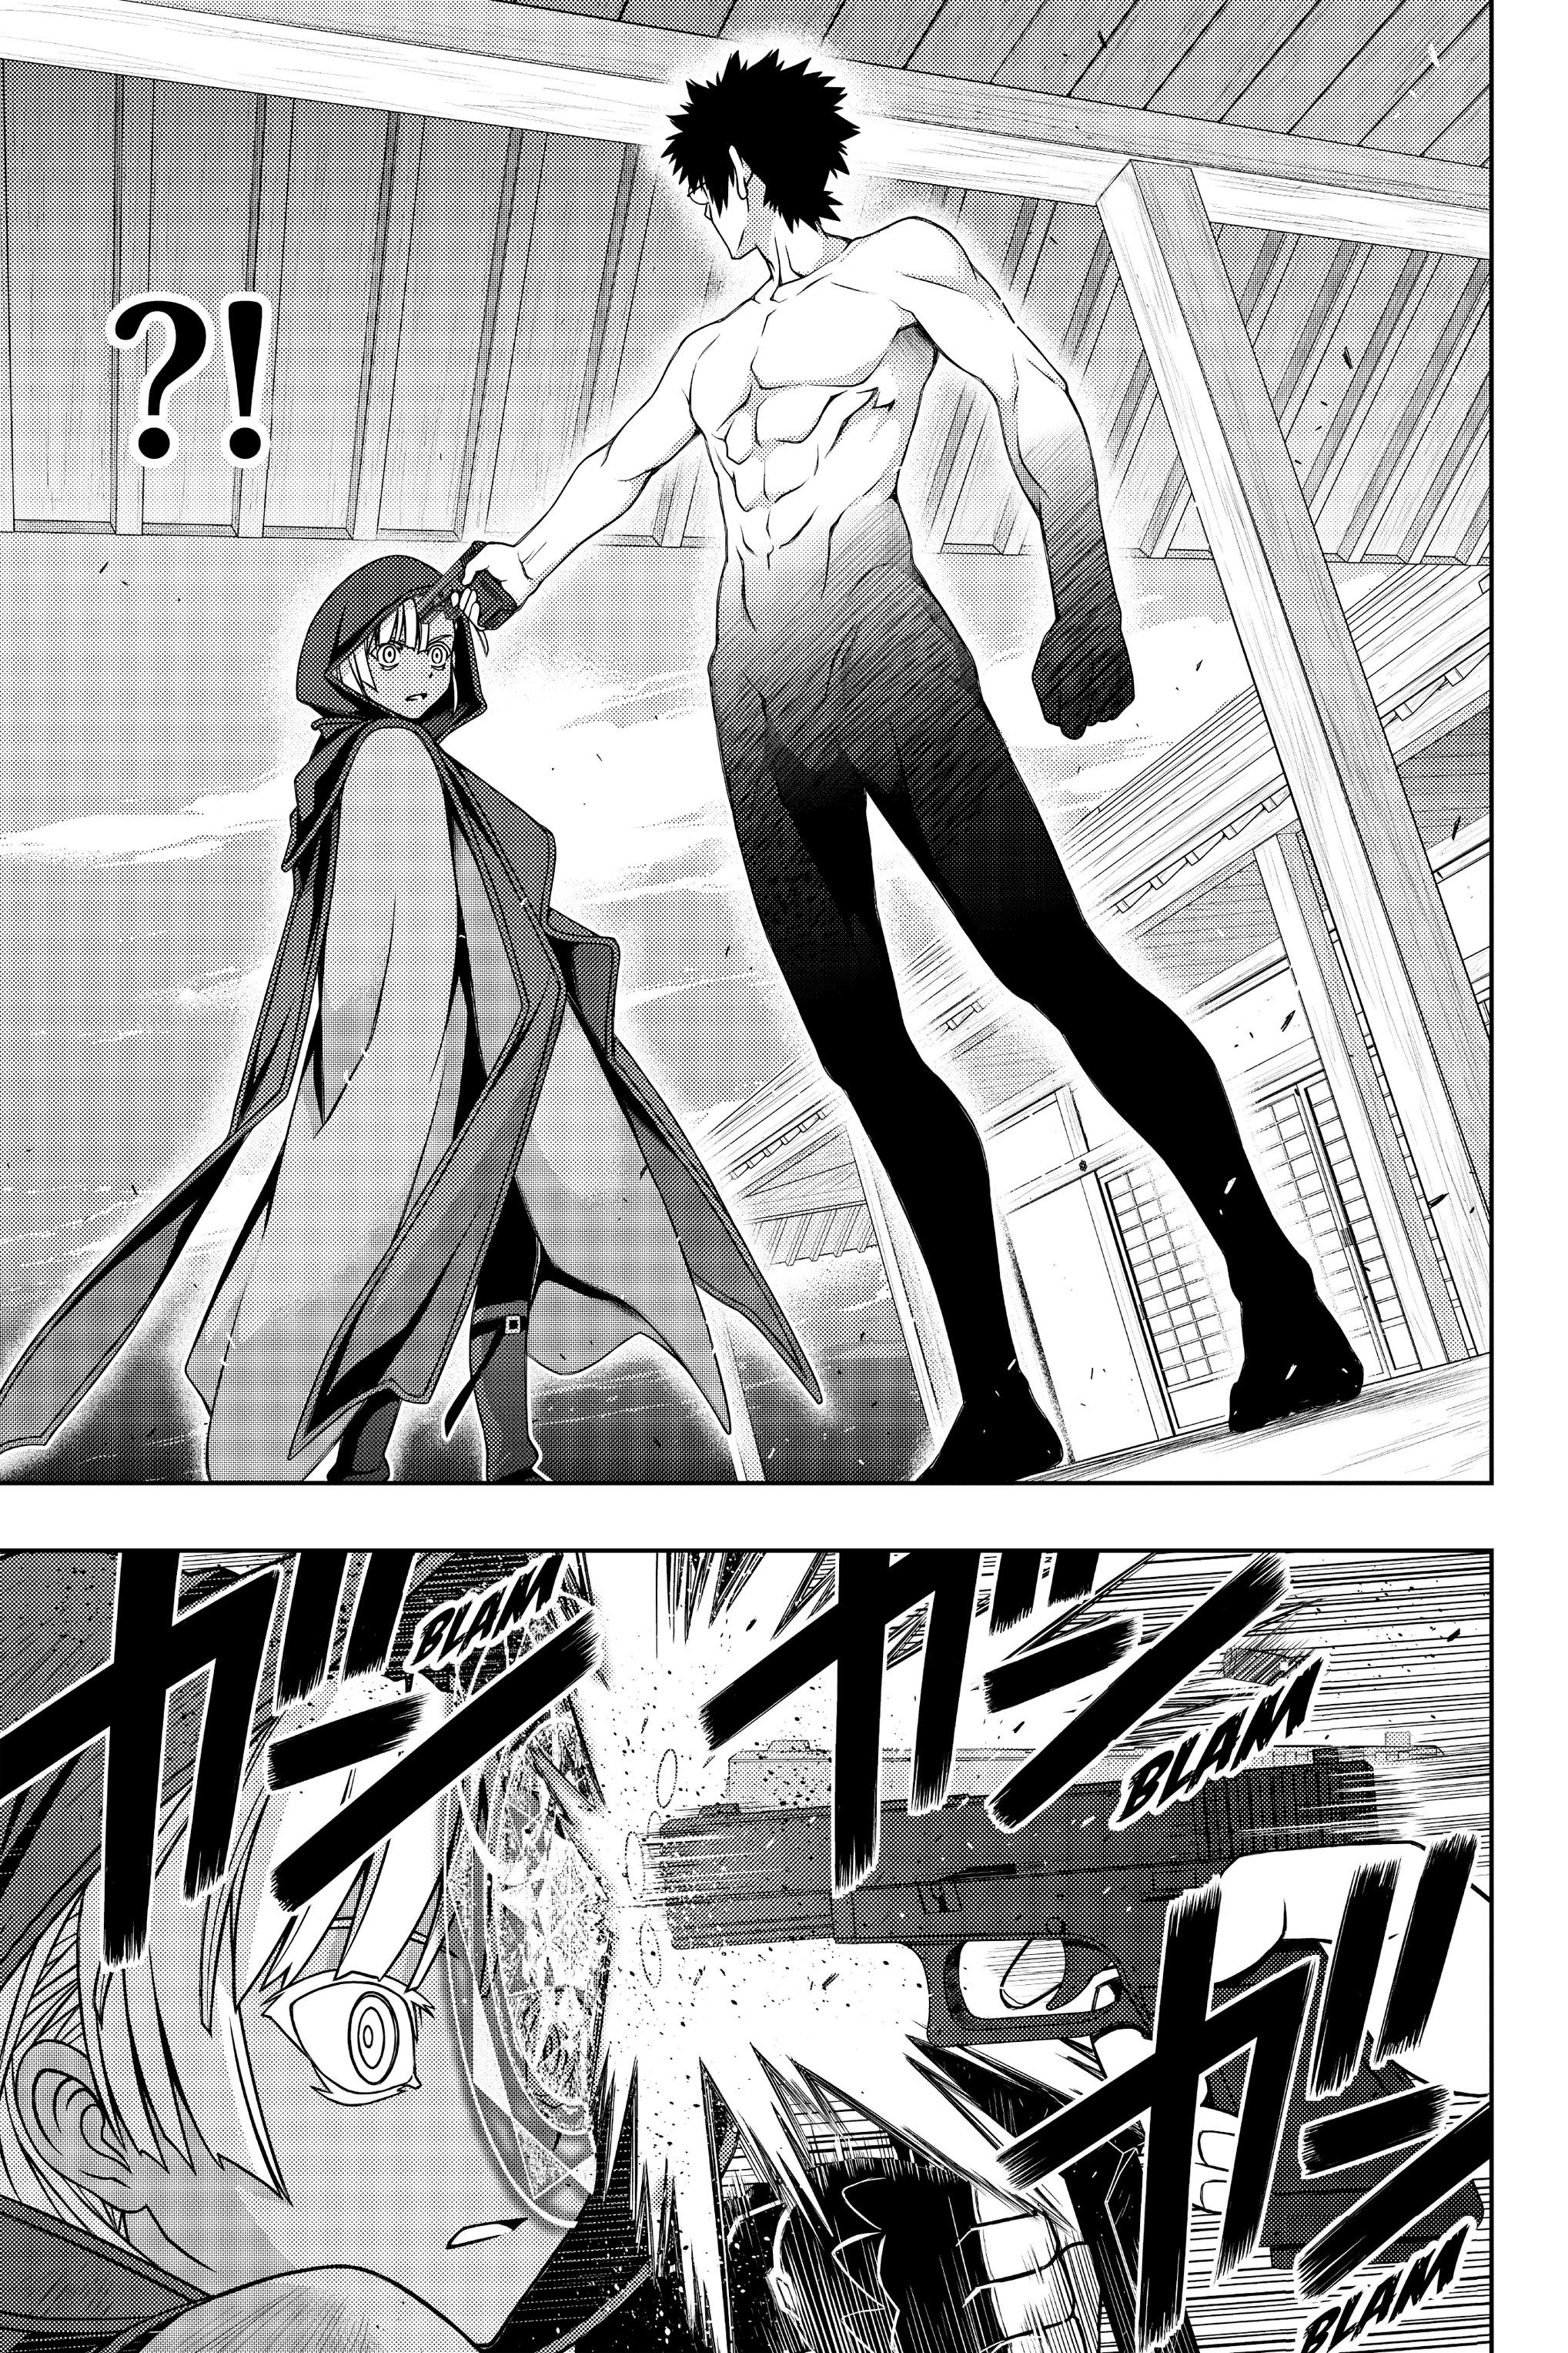 Uq Holder Chapter 141 Manga Review Astronerdboy S Anime Manga